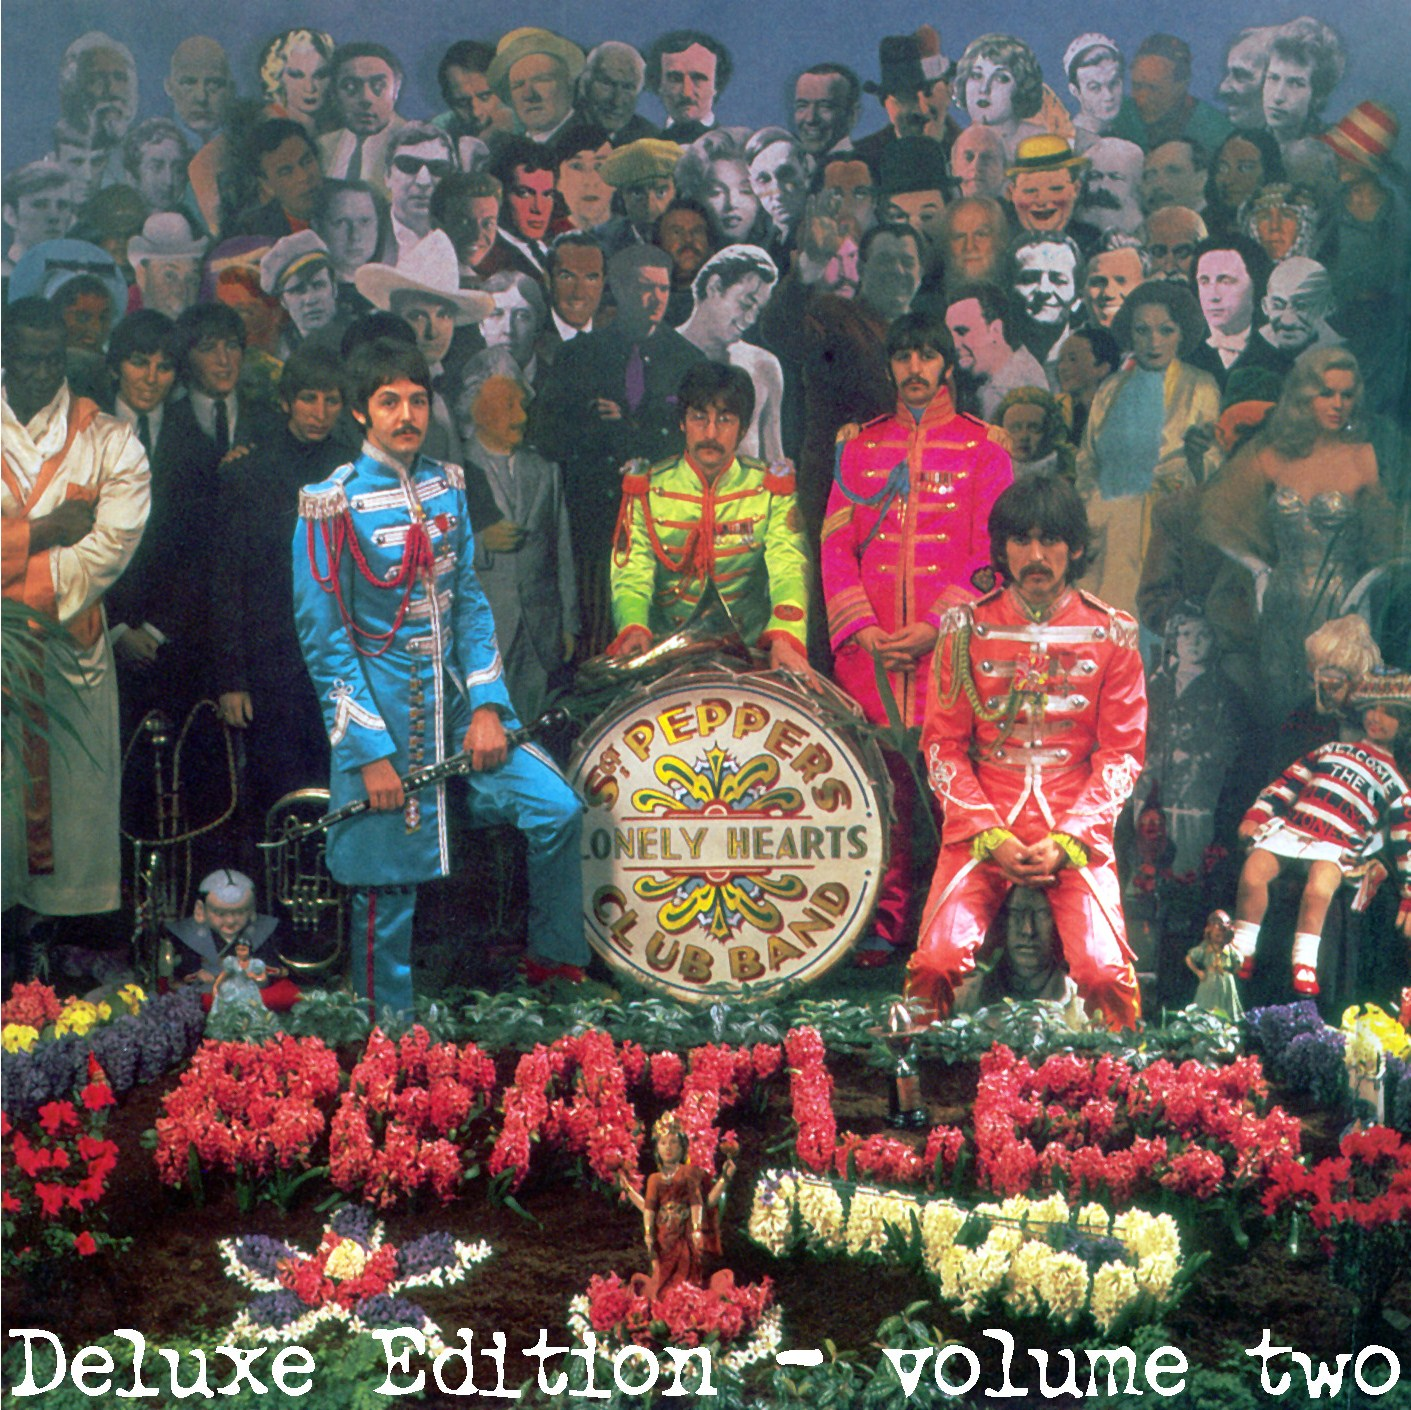 Beatles Lonely Hearts : p s beatleblog sgt pepper 39 s lonely hearts club band purple chick ~ Vivirlamusica.com Haus und Dekorationen